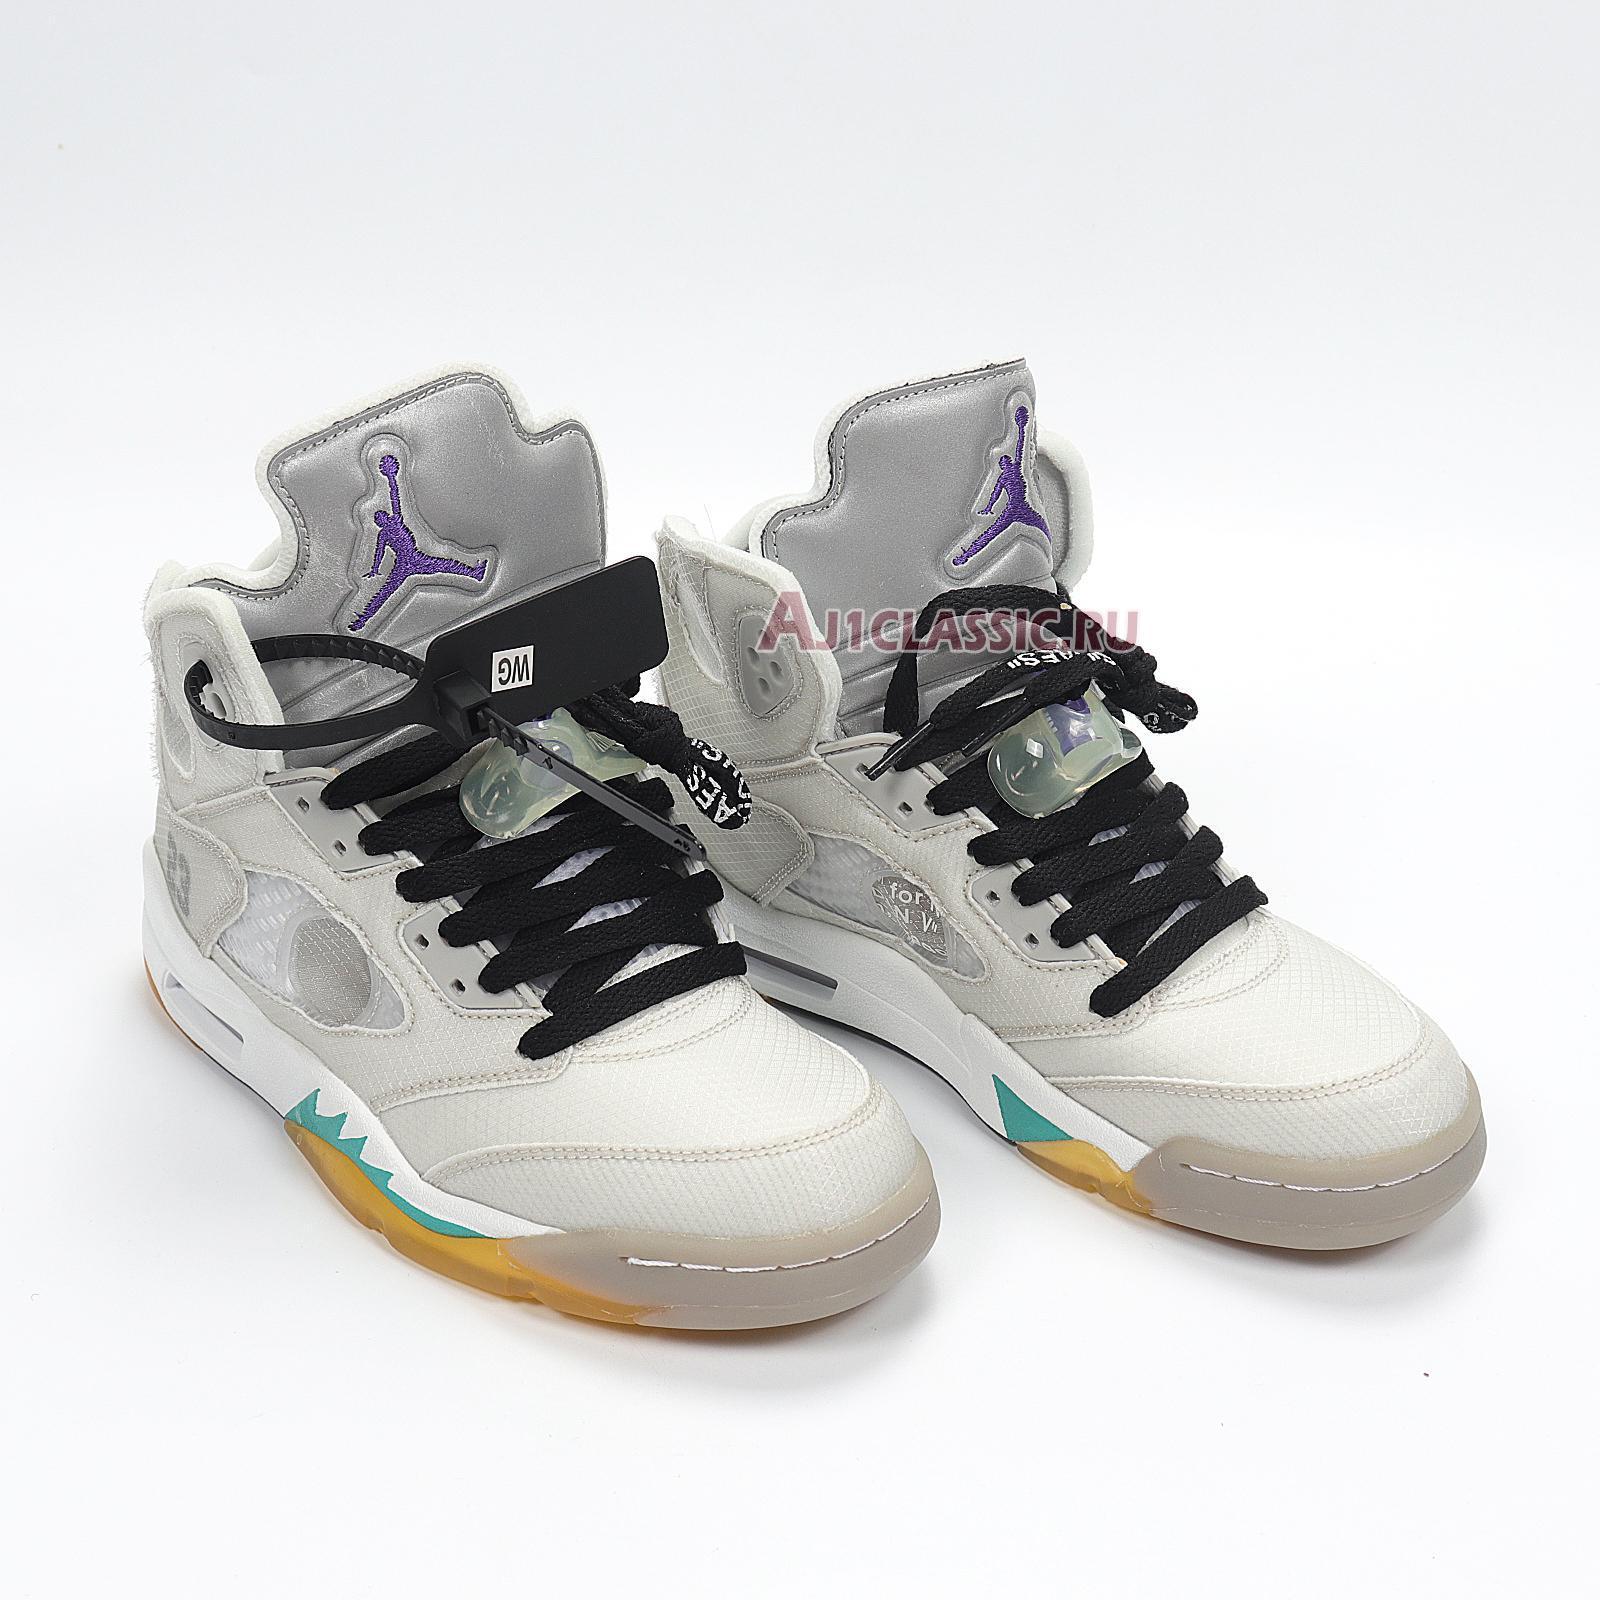 "Air Jordan 5 Retro ""Grey"" CT8480-105"